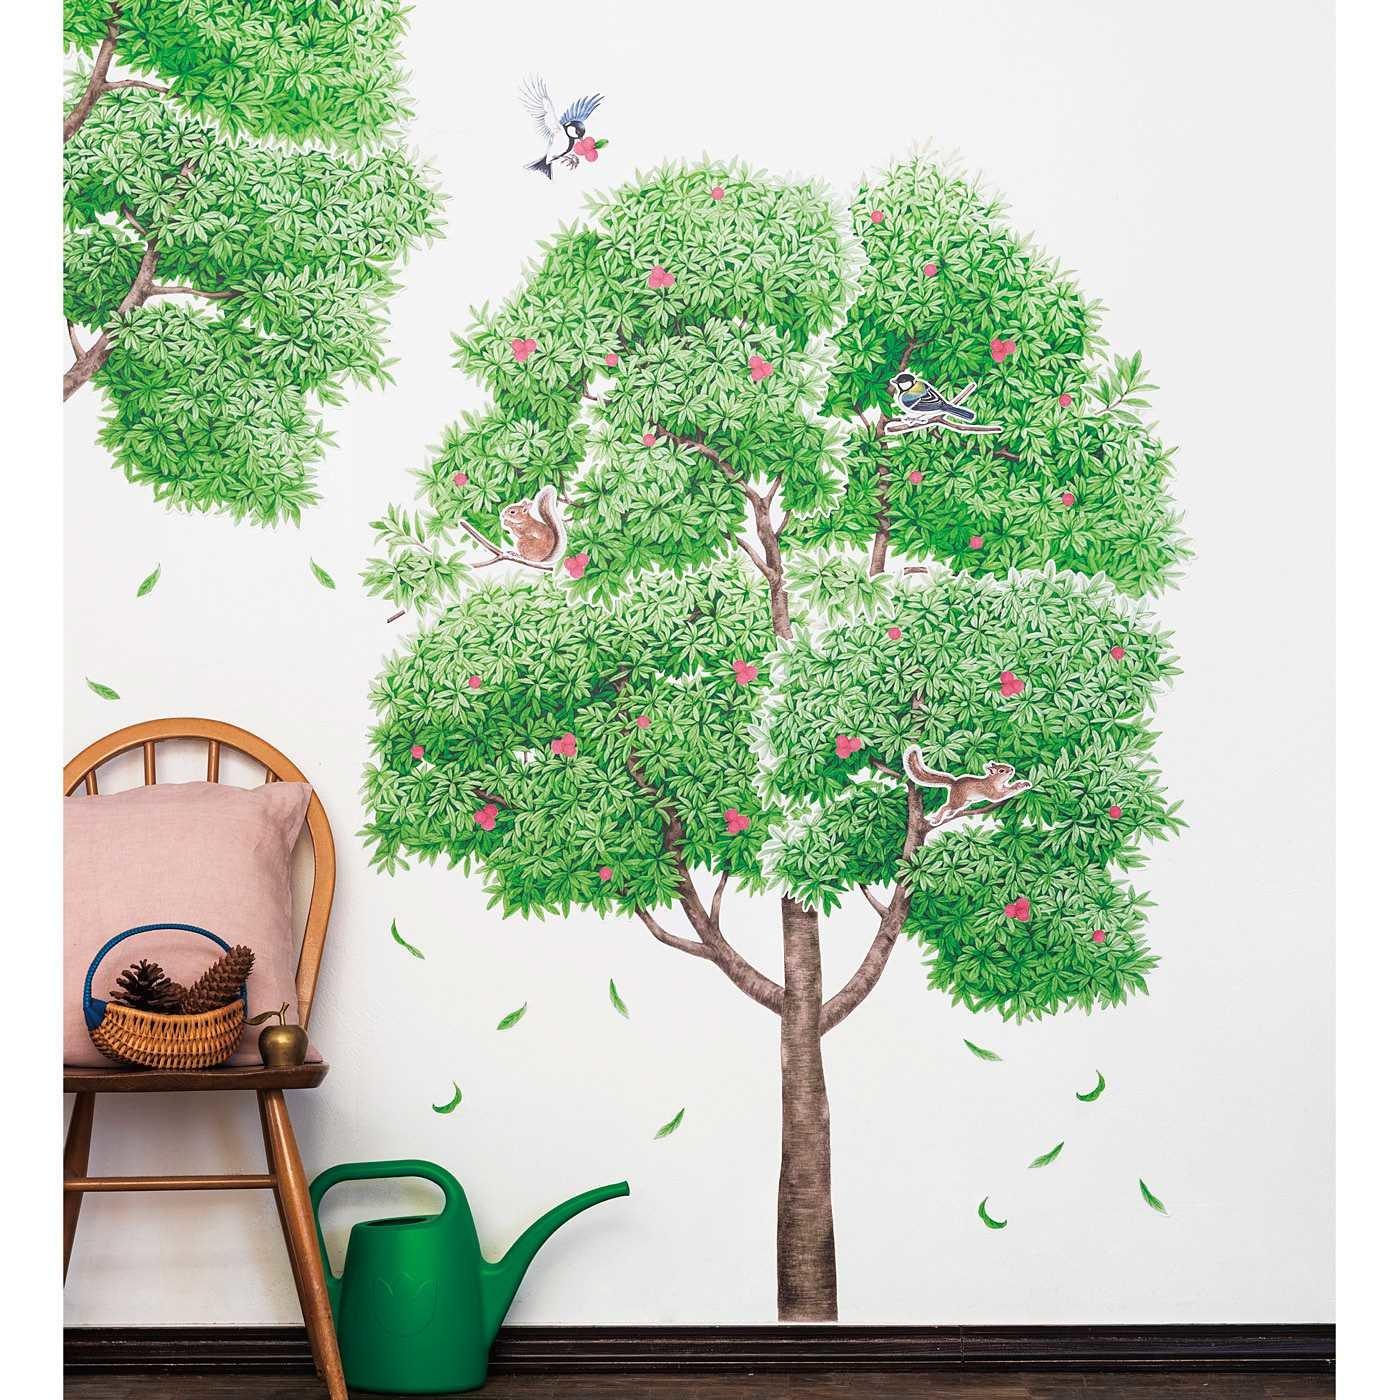 YOU+MORE! わが家のシンボルツリー 大きな木になるウォールシールの会